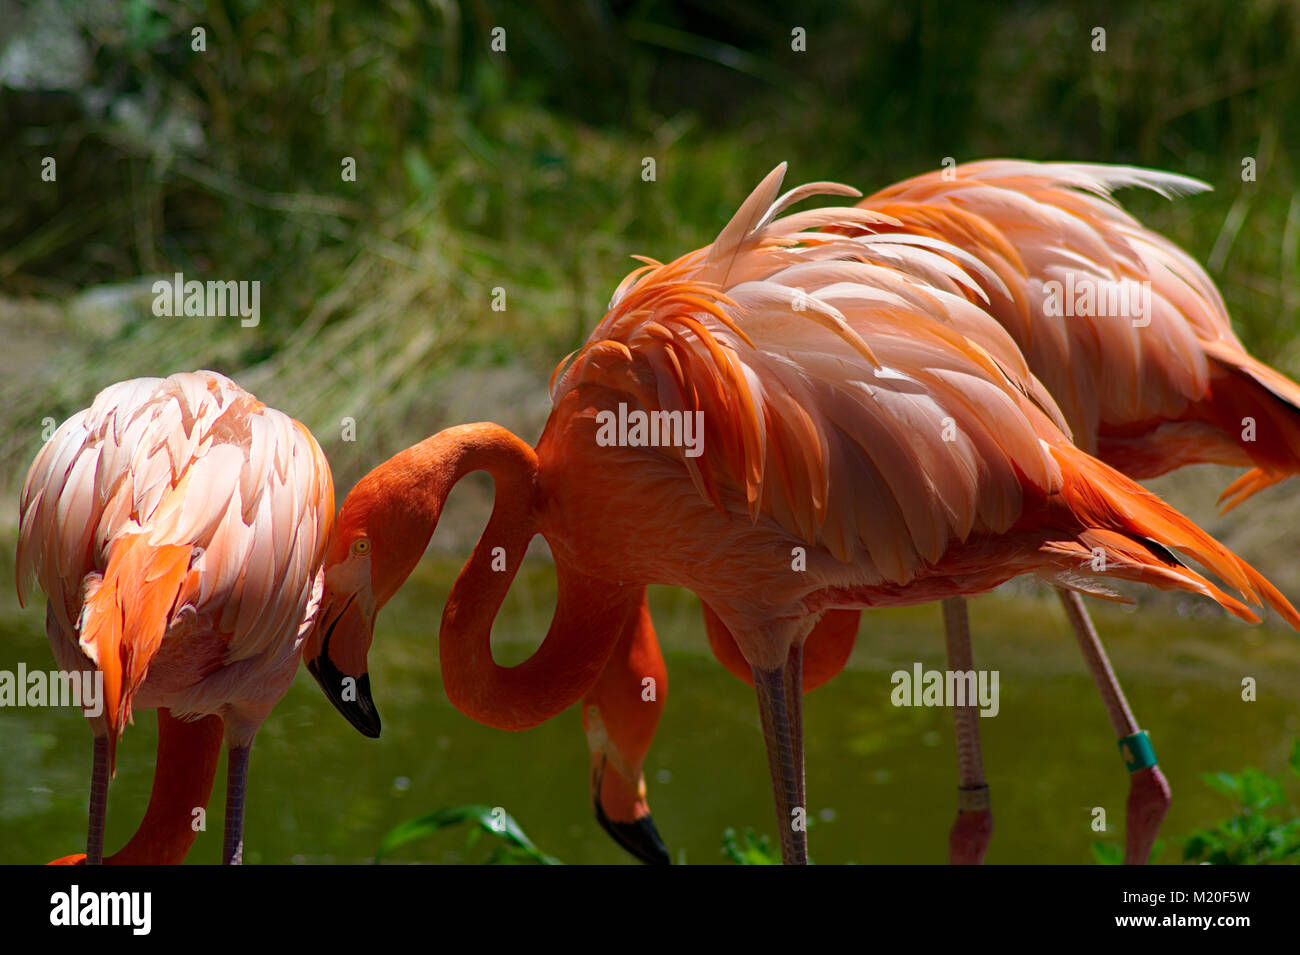 Flamingos at Baltimore Zoo - Stock Image